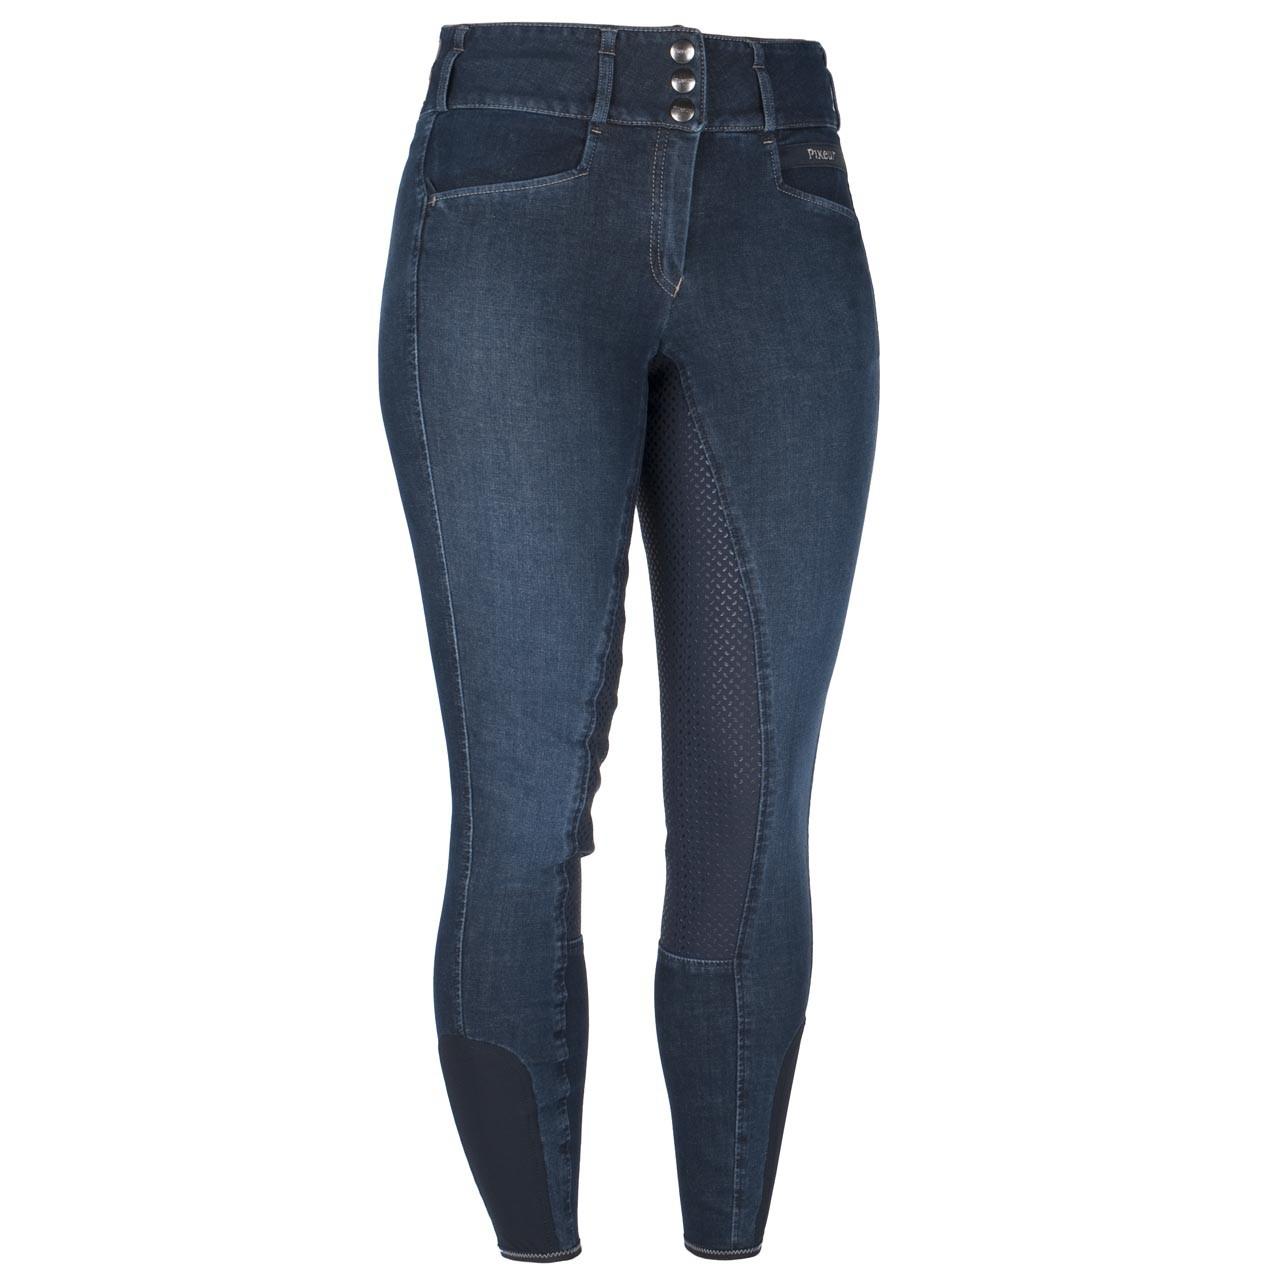 Pikeur Candela Grip jeans rijbroek blauw maat:44